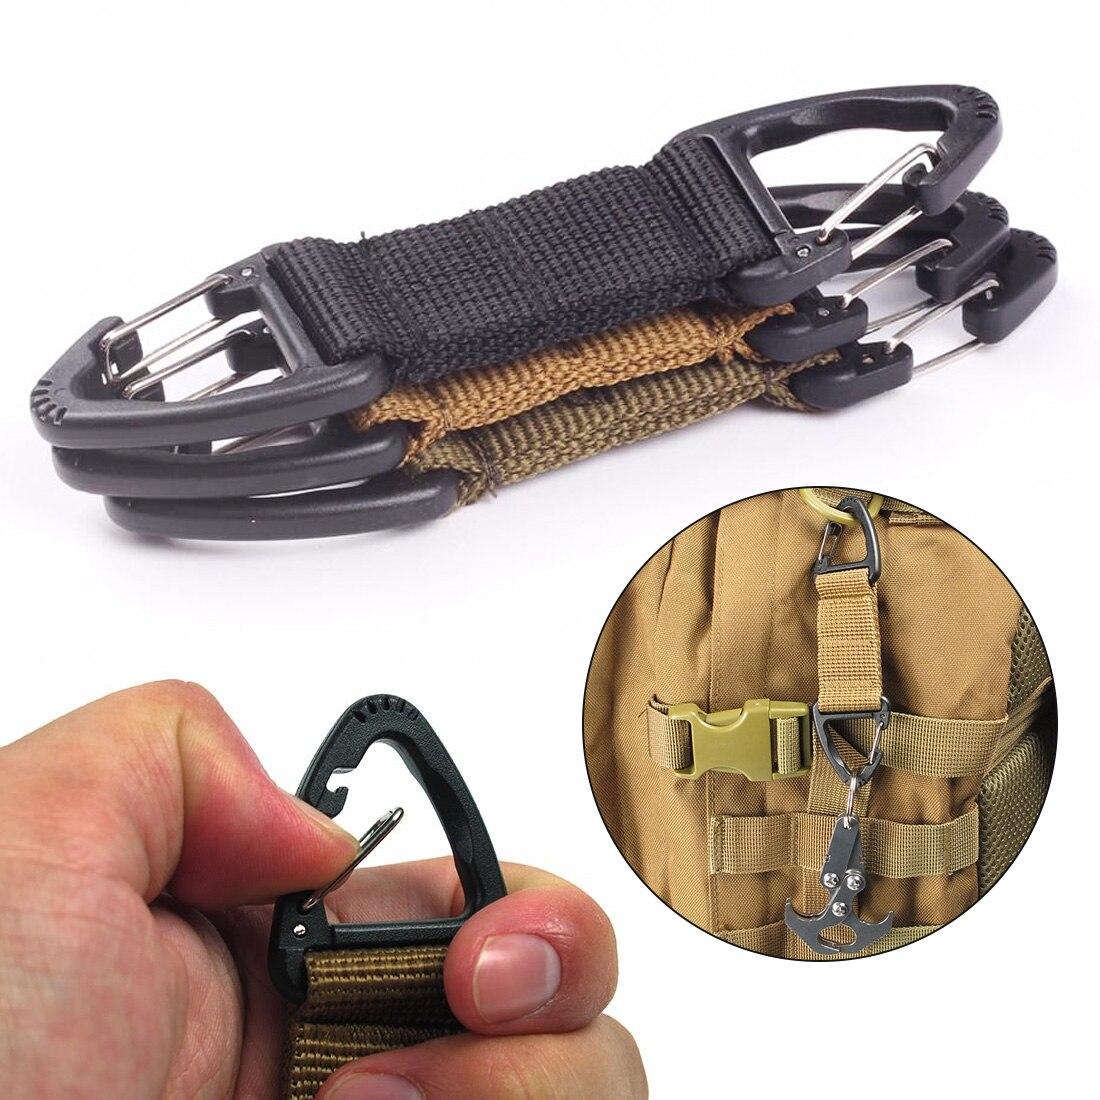 Outdoor Nylon Webbing Belt Clip Climbing Carabiner Buckle Tactical Backpack Bag Webbing Belt Clip Clasp Hanging Chain Key Hook